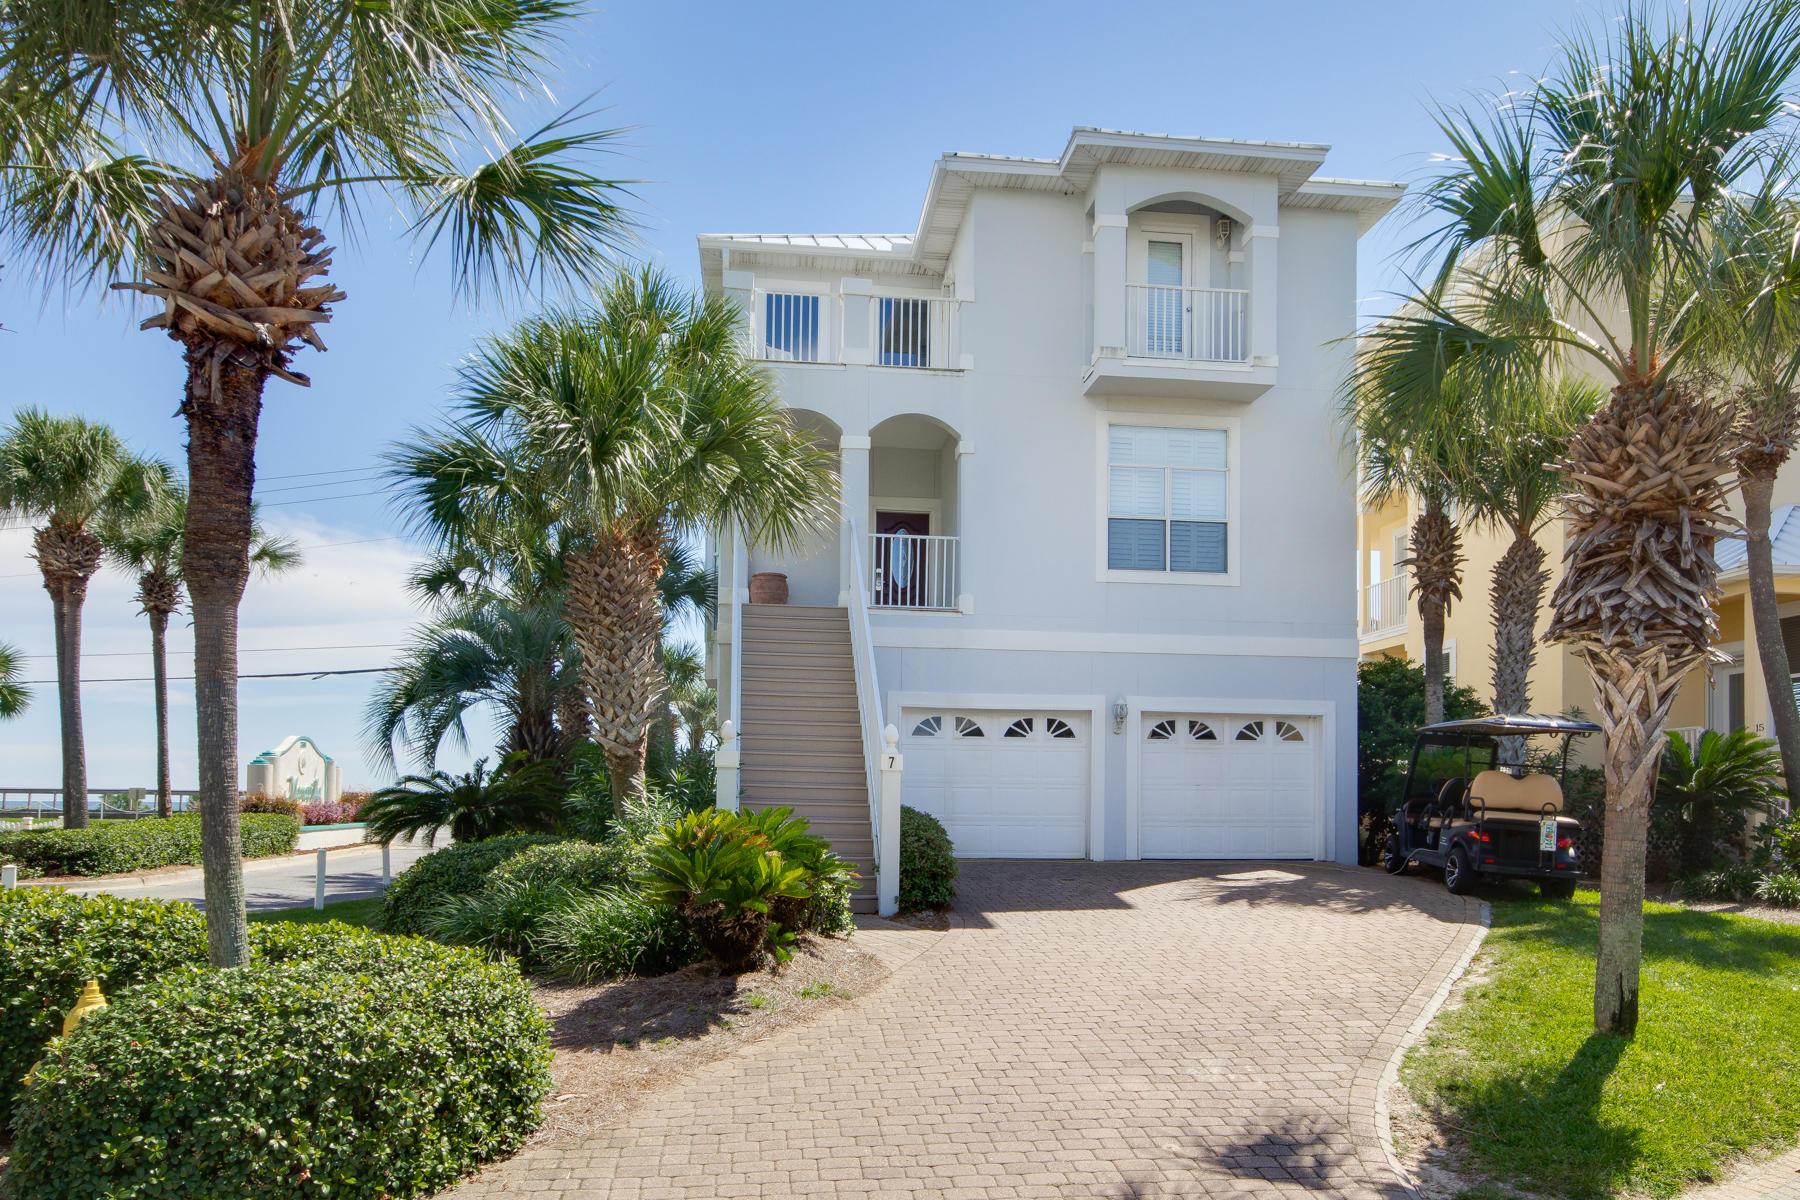 Photo of home for sale at 7 St Martin, Miramar Beach FL